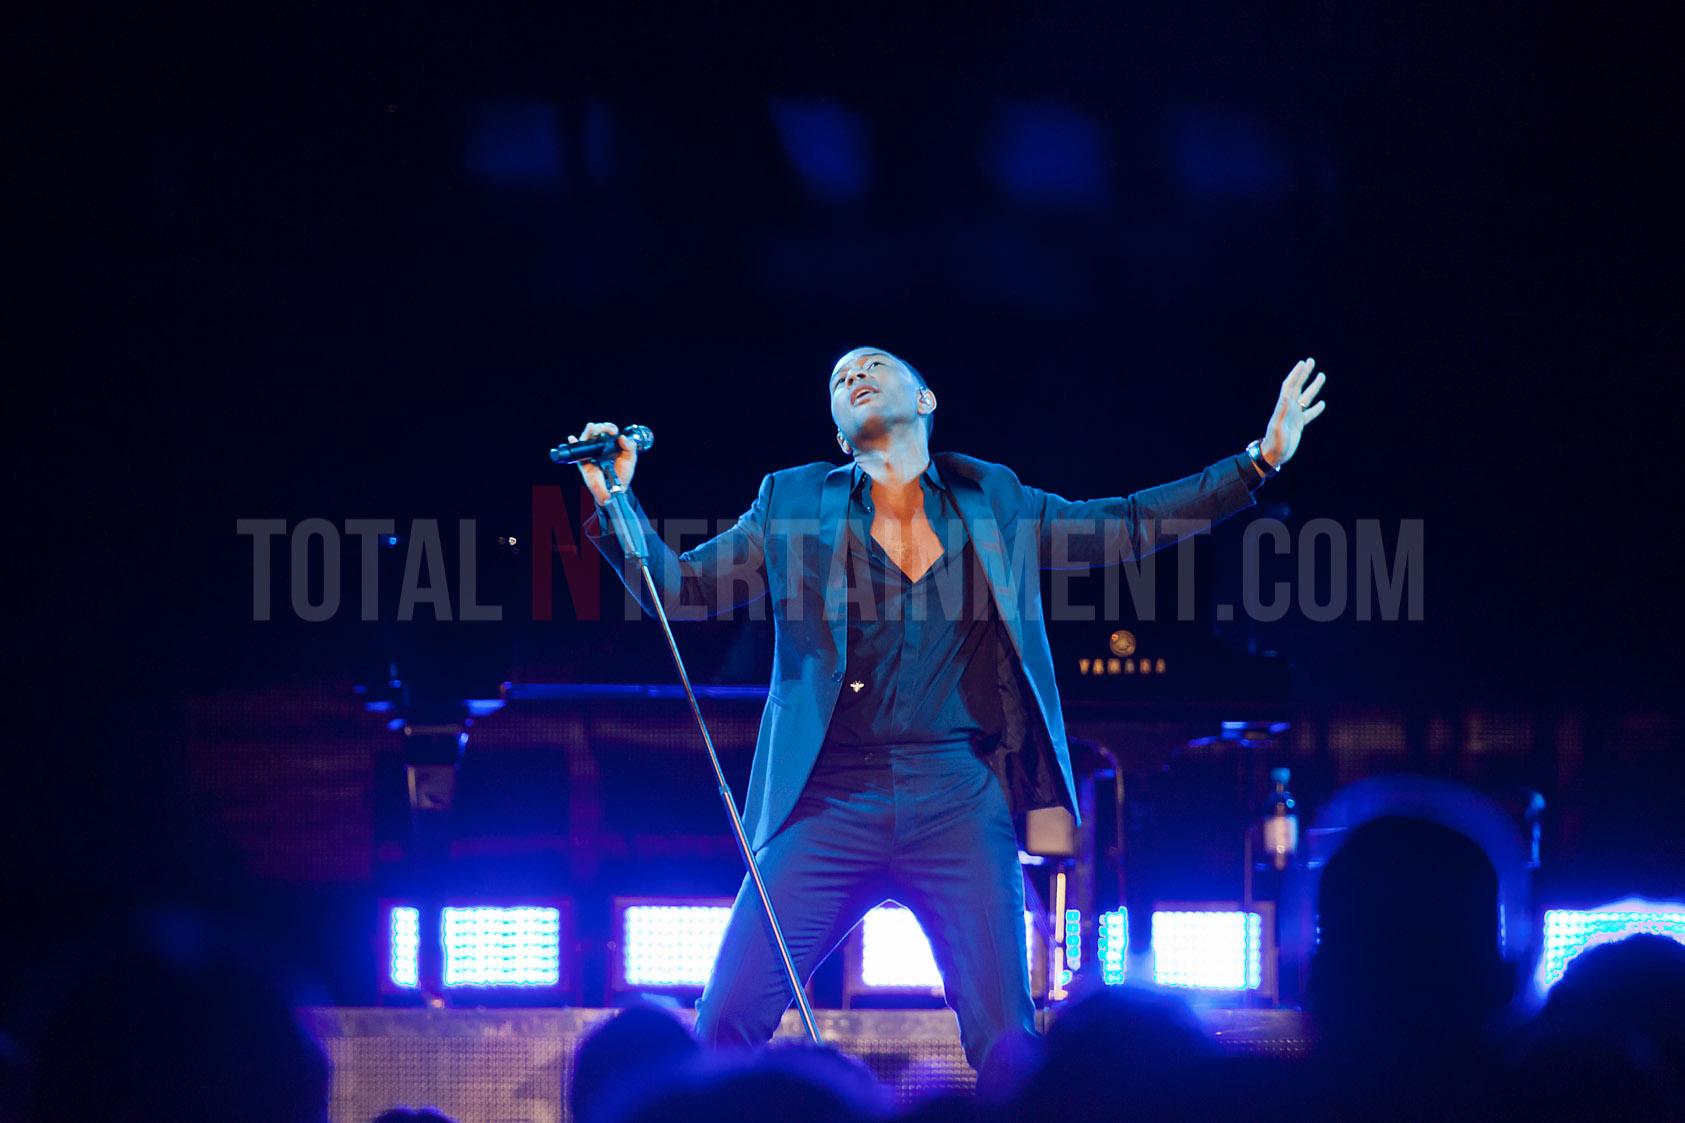 John Legend, Liverpool, Concert, Live Event